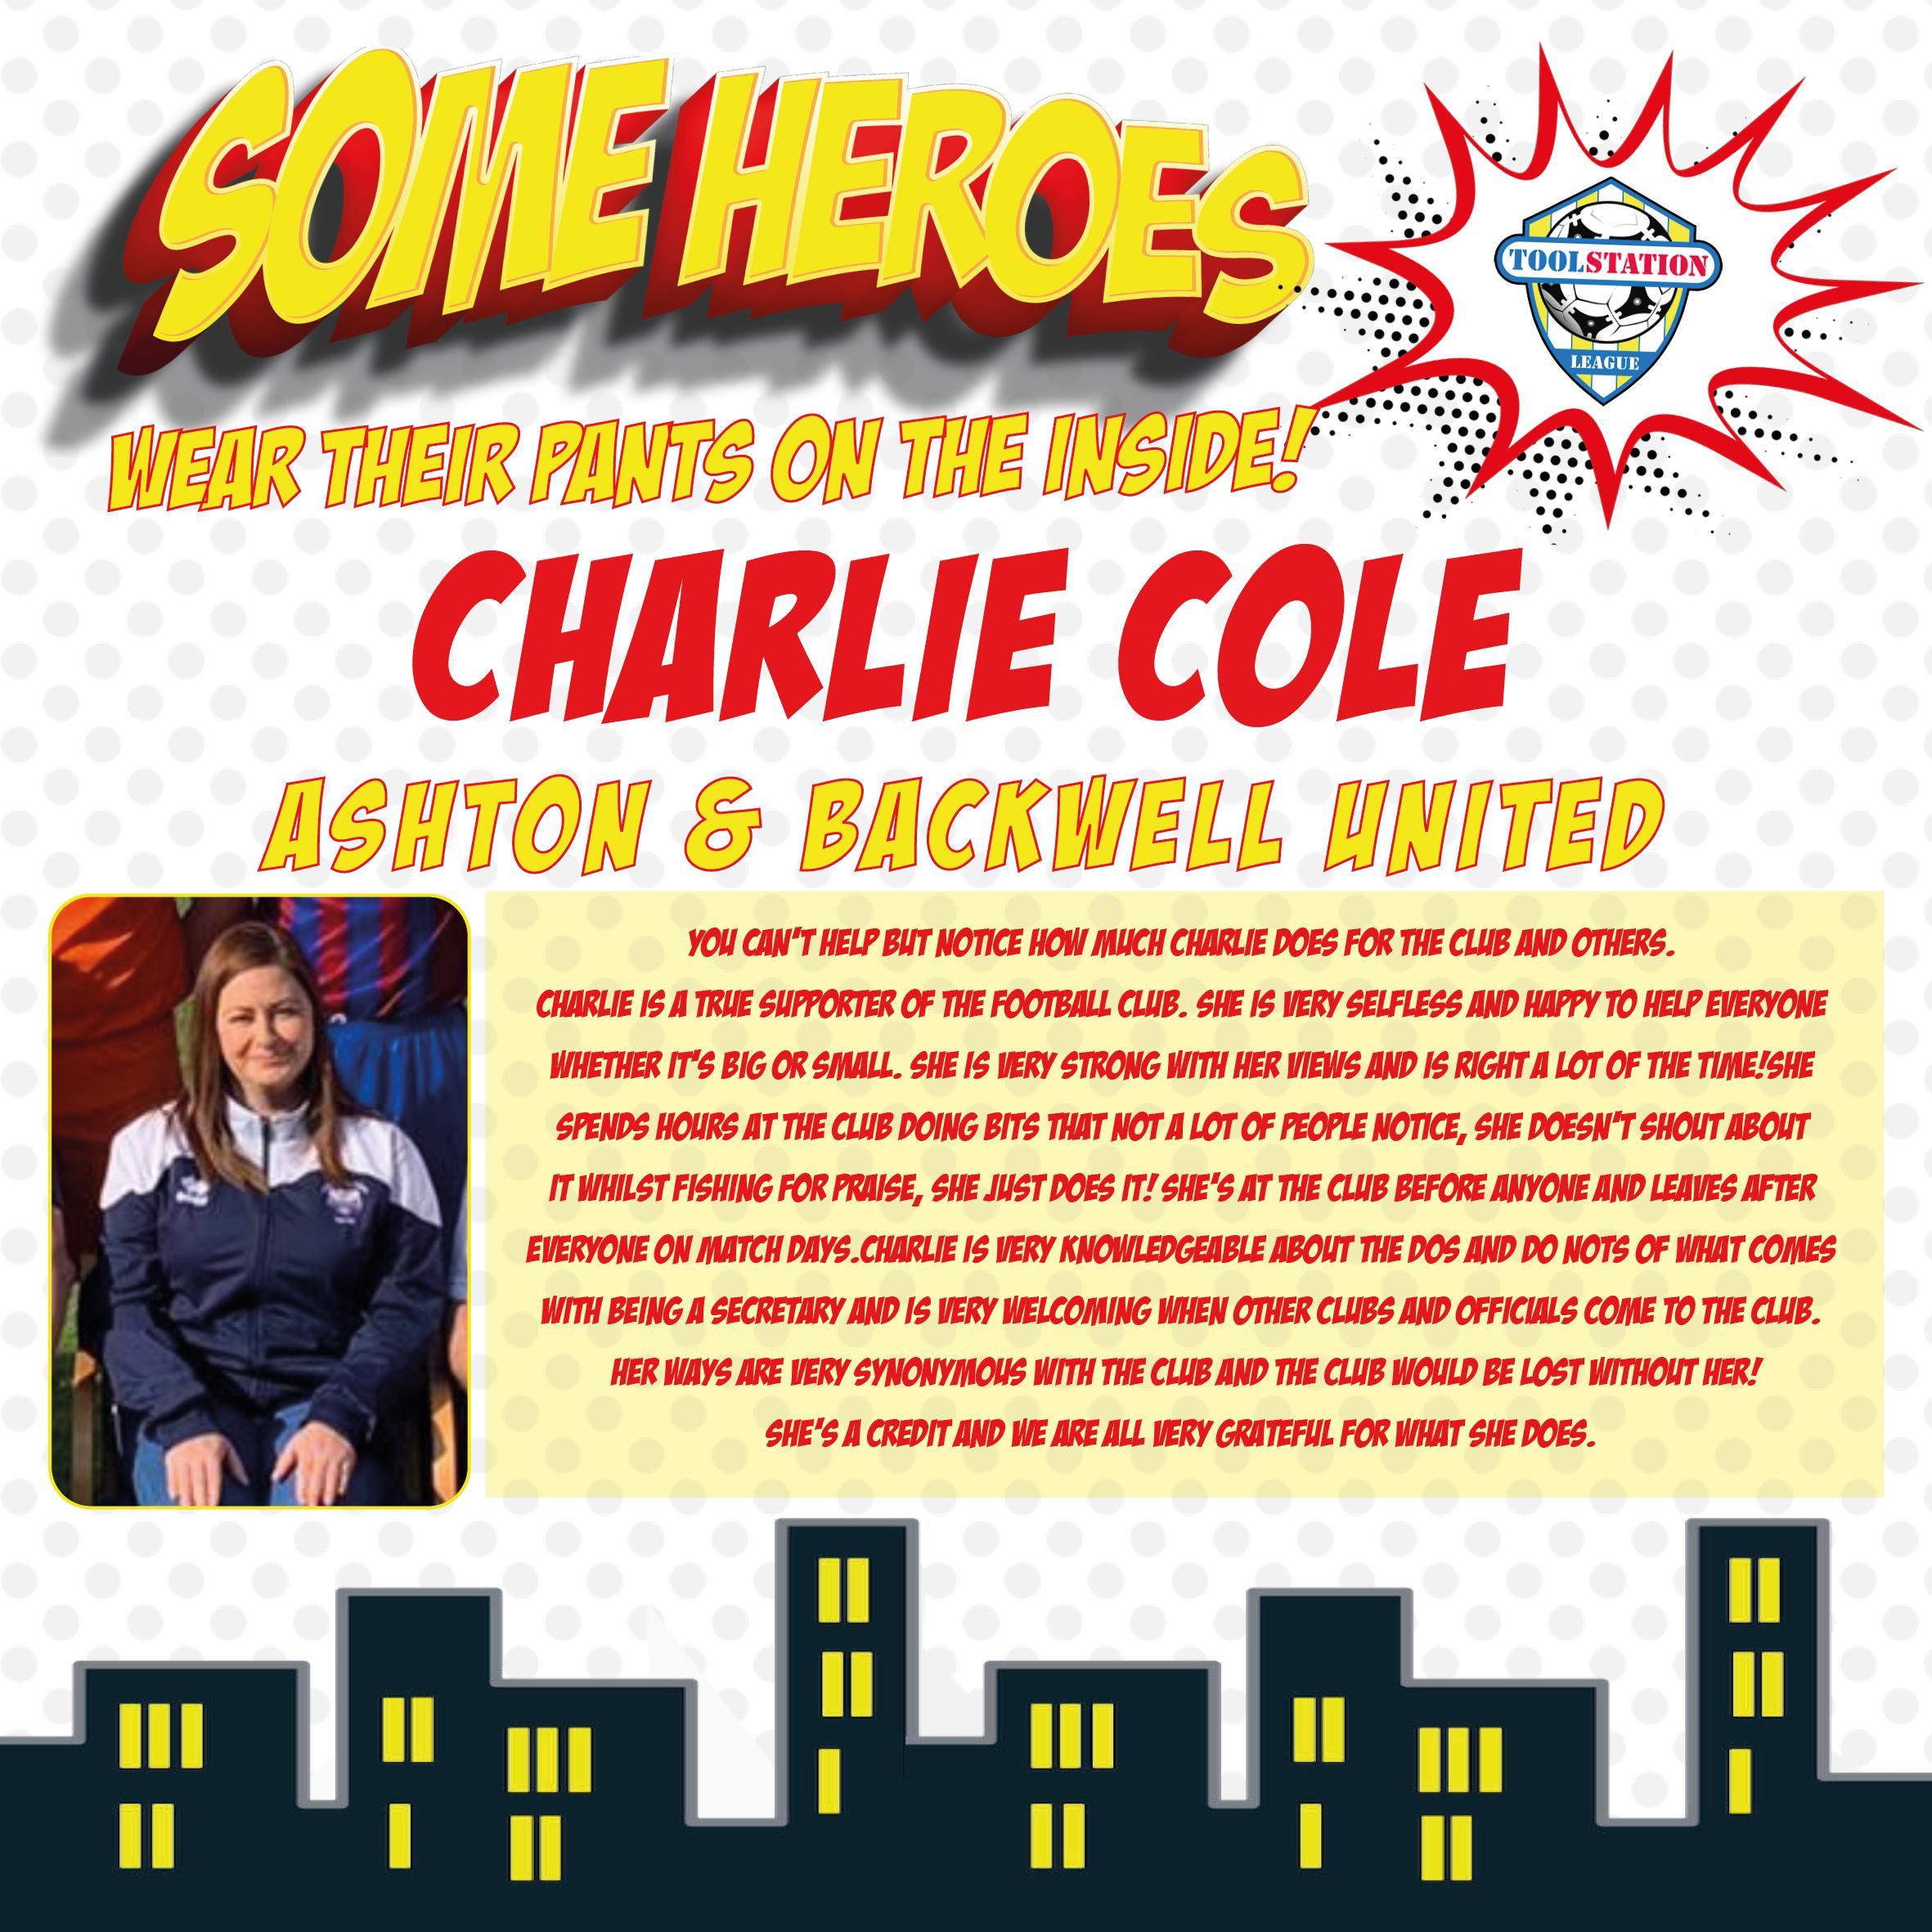 Charlie Cole